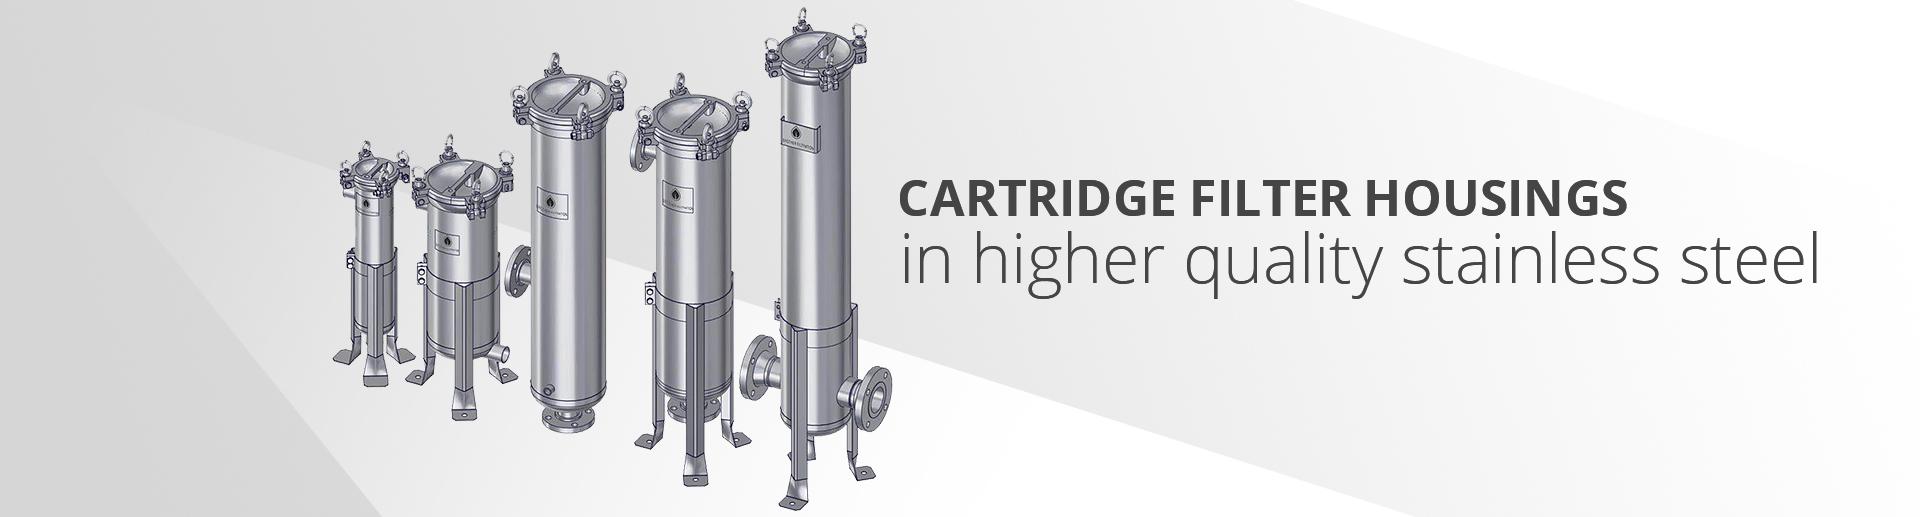 Stainless Steel Cartridge Filter Housings